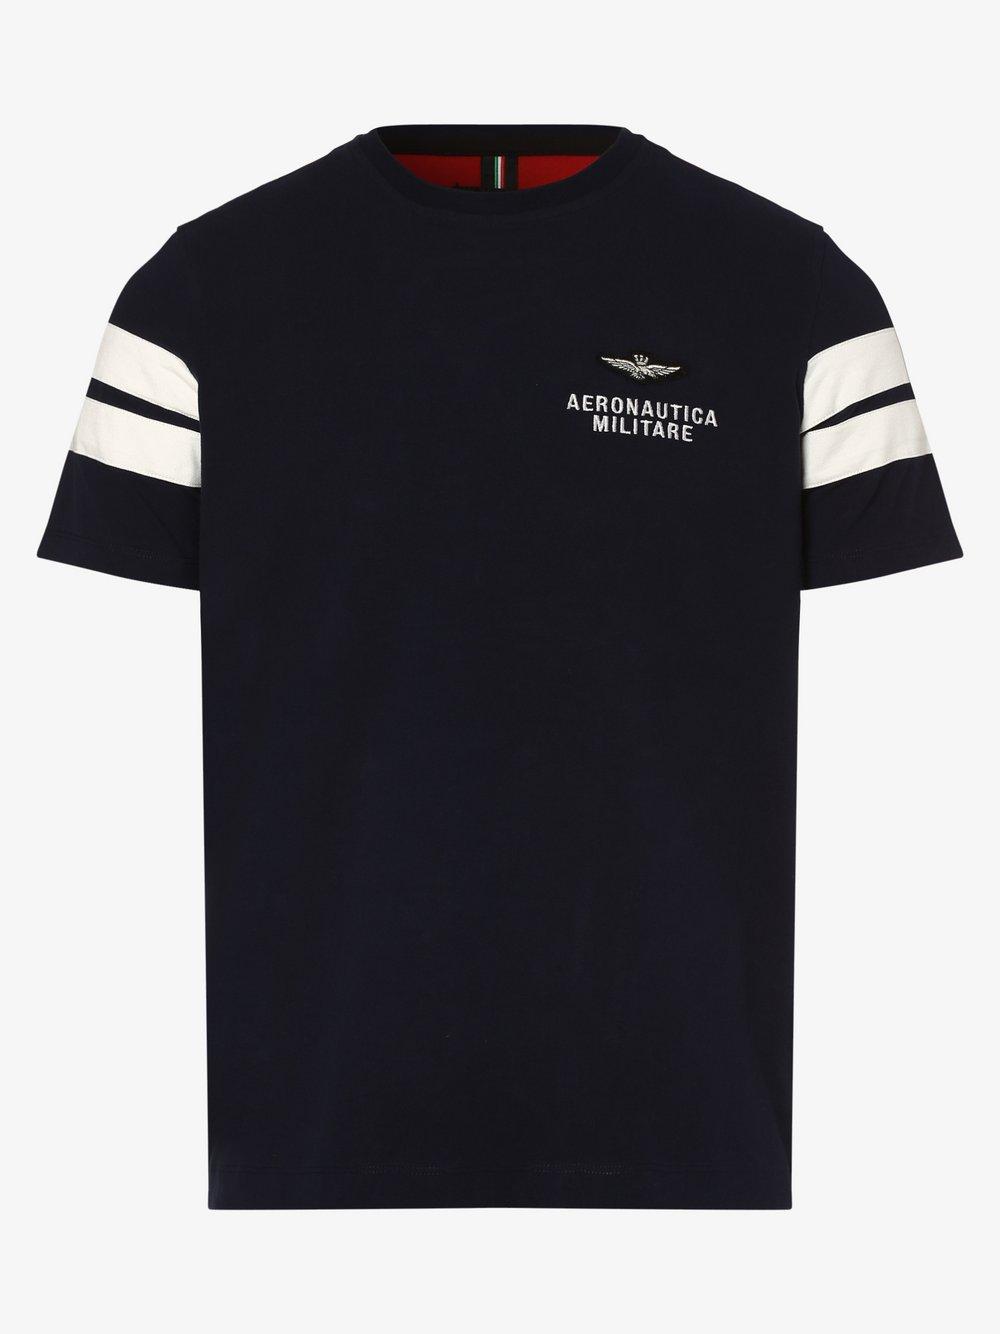 Aeronautica – T-shirt męski, niebieski Van Graaf 477207-0001-09920